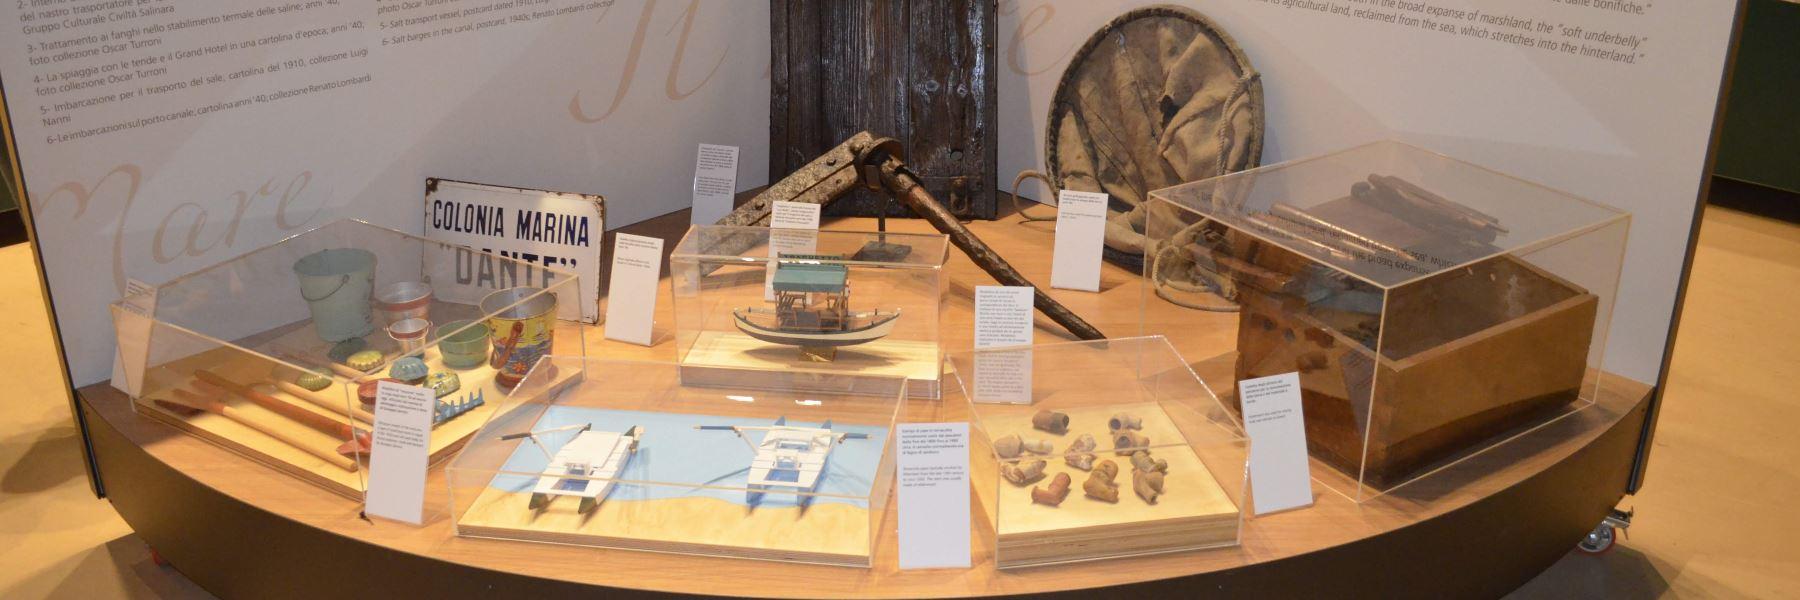 Musa - Salt Museum